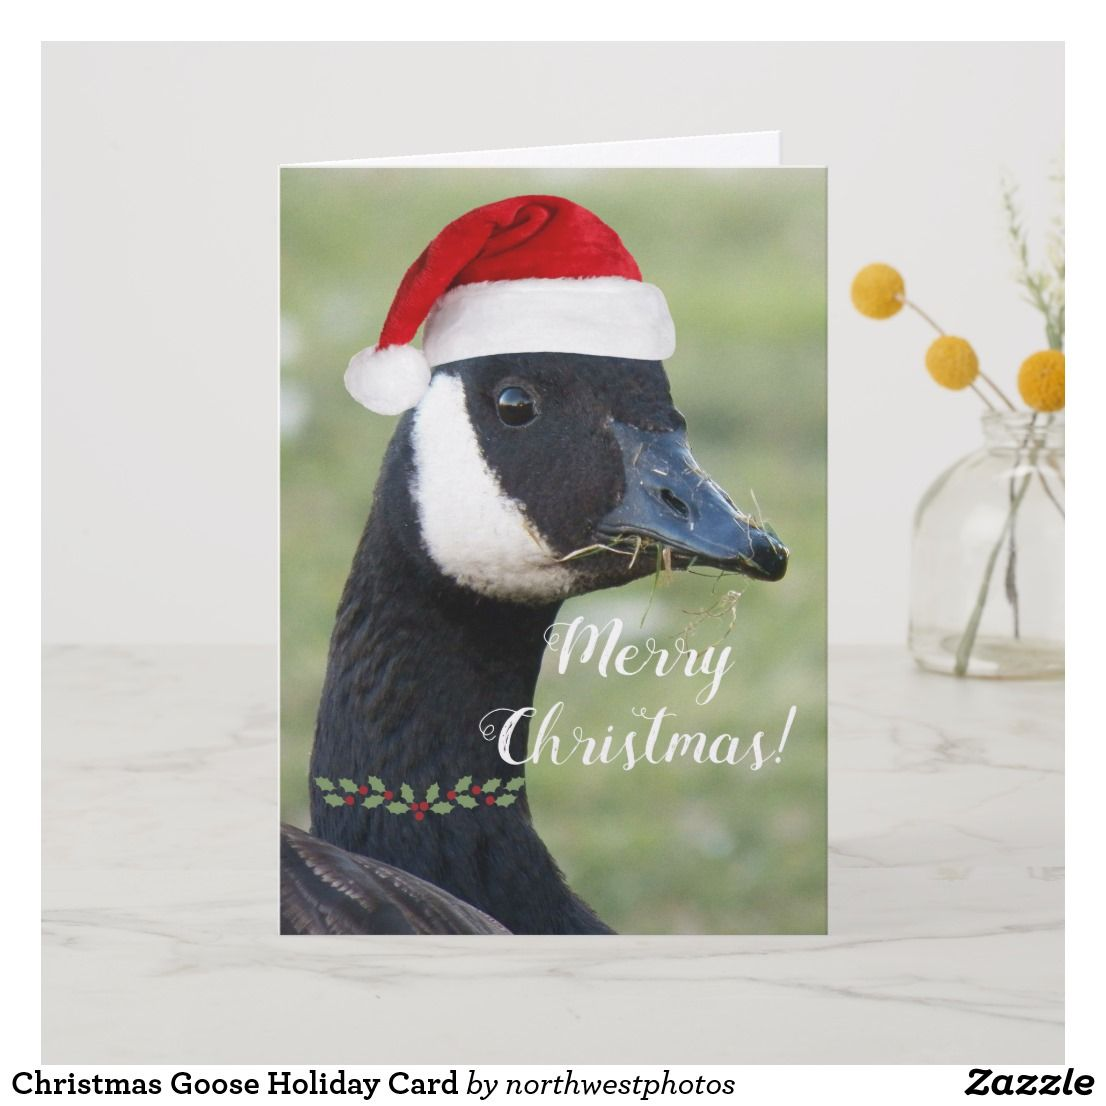 Christmas goose whimsical photo holiday card